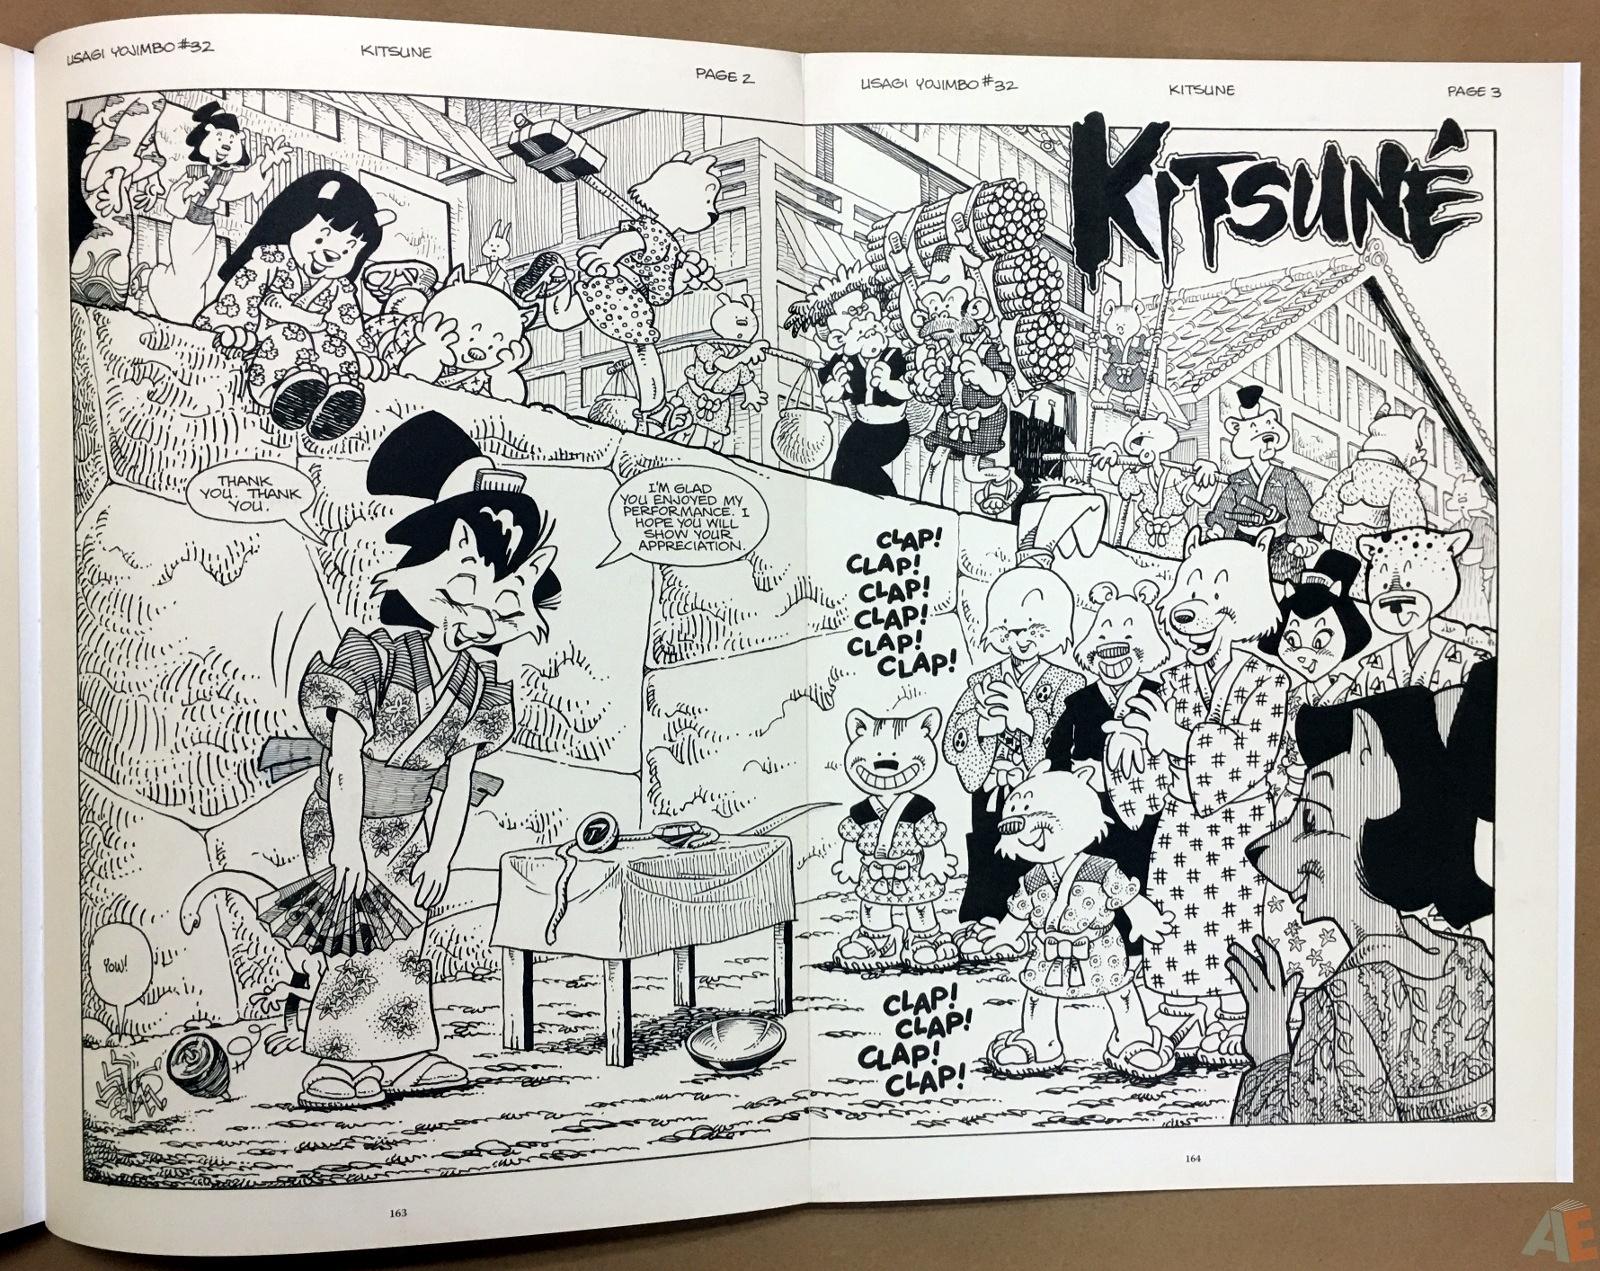 Usagi Yojimbo: Samurai and Other Stories Gallery Edition 30